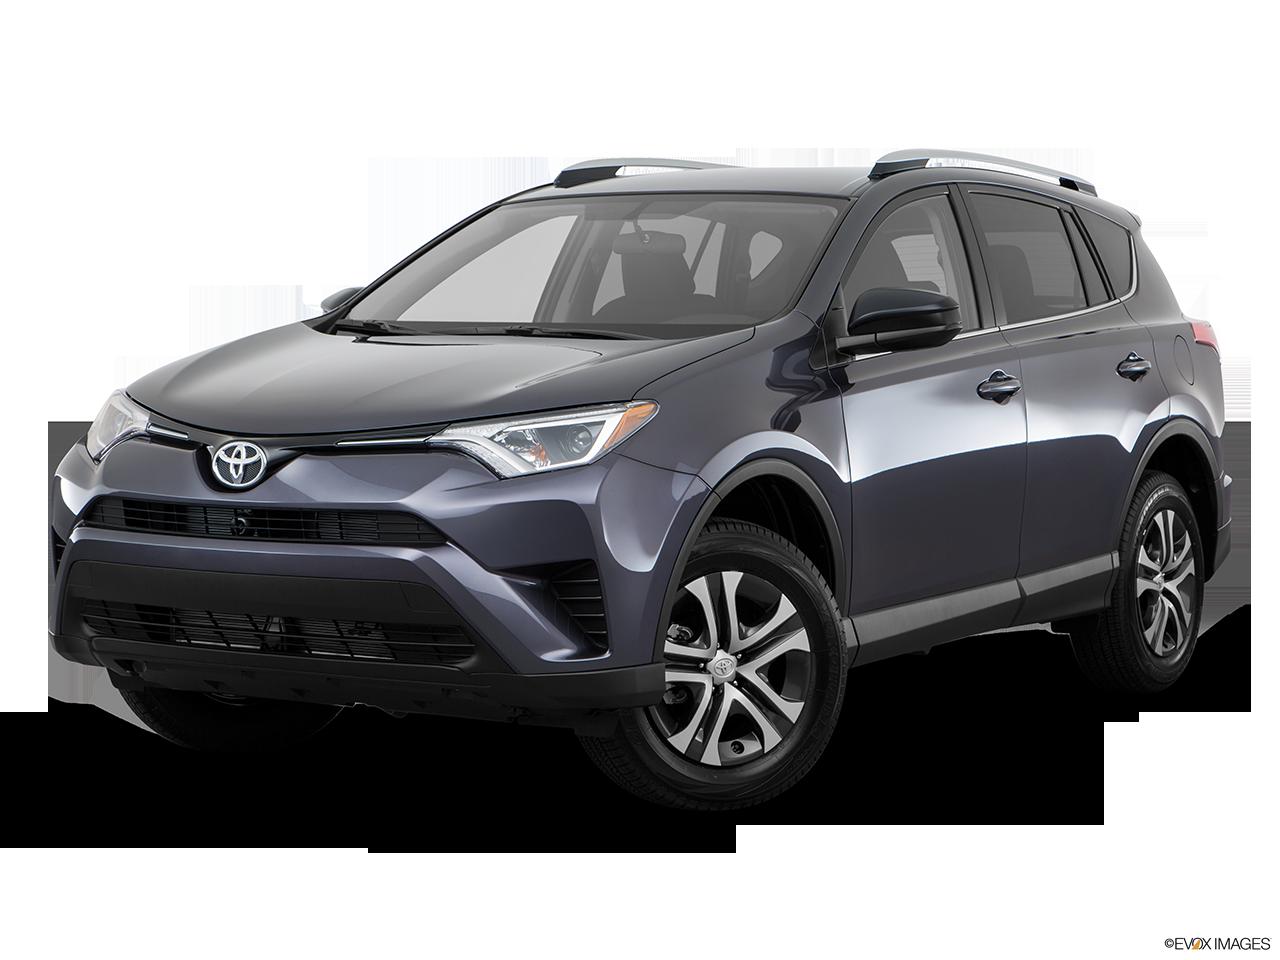 Honda Dealership Orange County >> Tustin Toyota | 2016 Toyota RAV4 info for Orange County